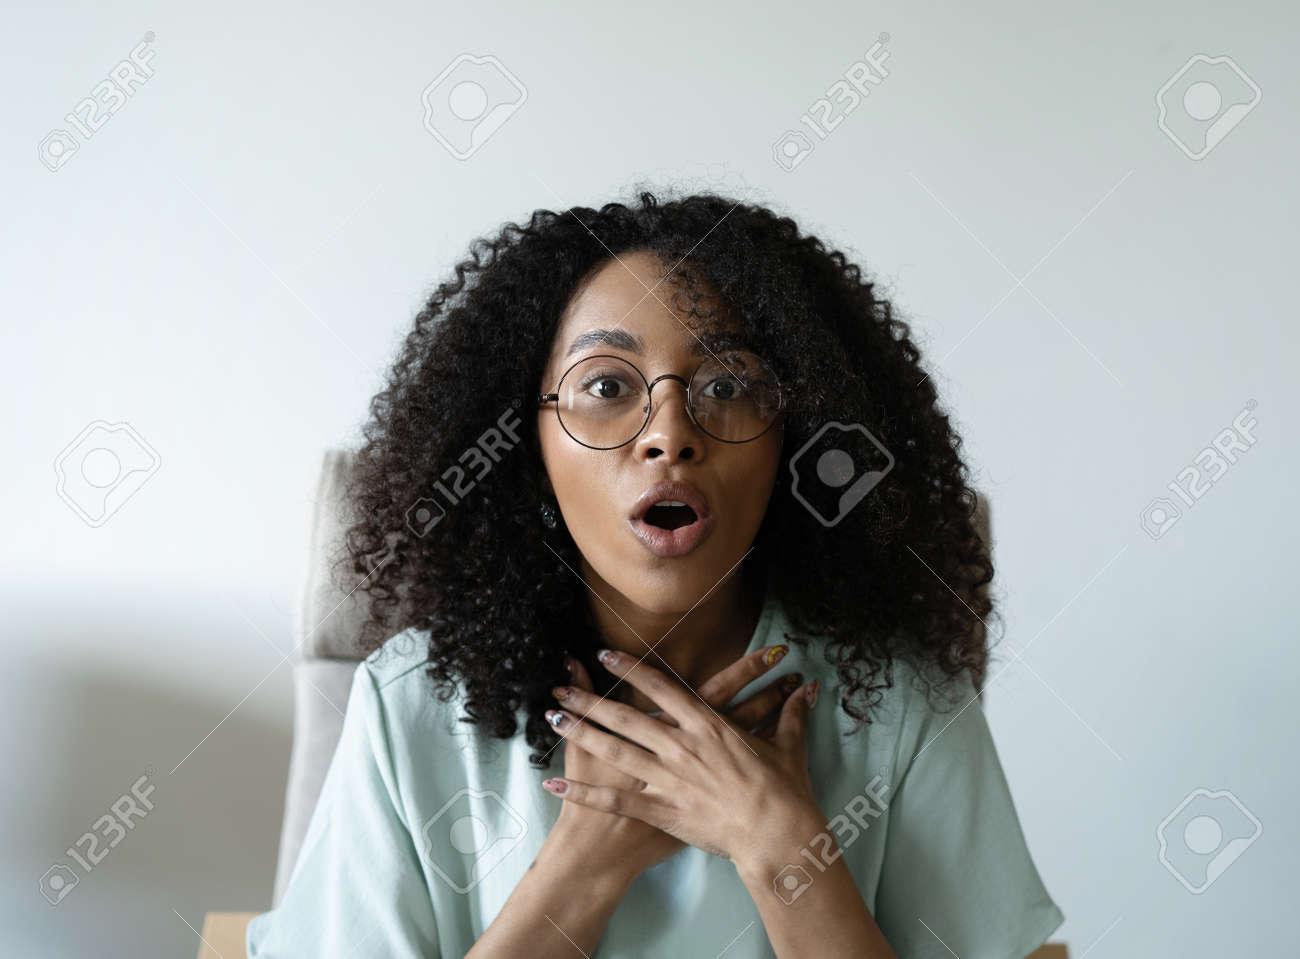 Head shot portrait friendly talking mixed race woman, looking at camera, making video call, recording vlog or webinar - 170765776